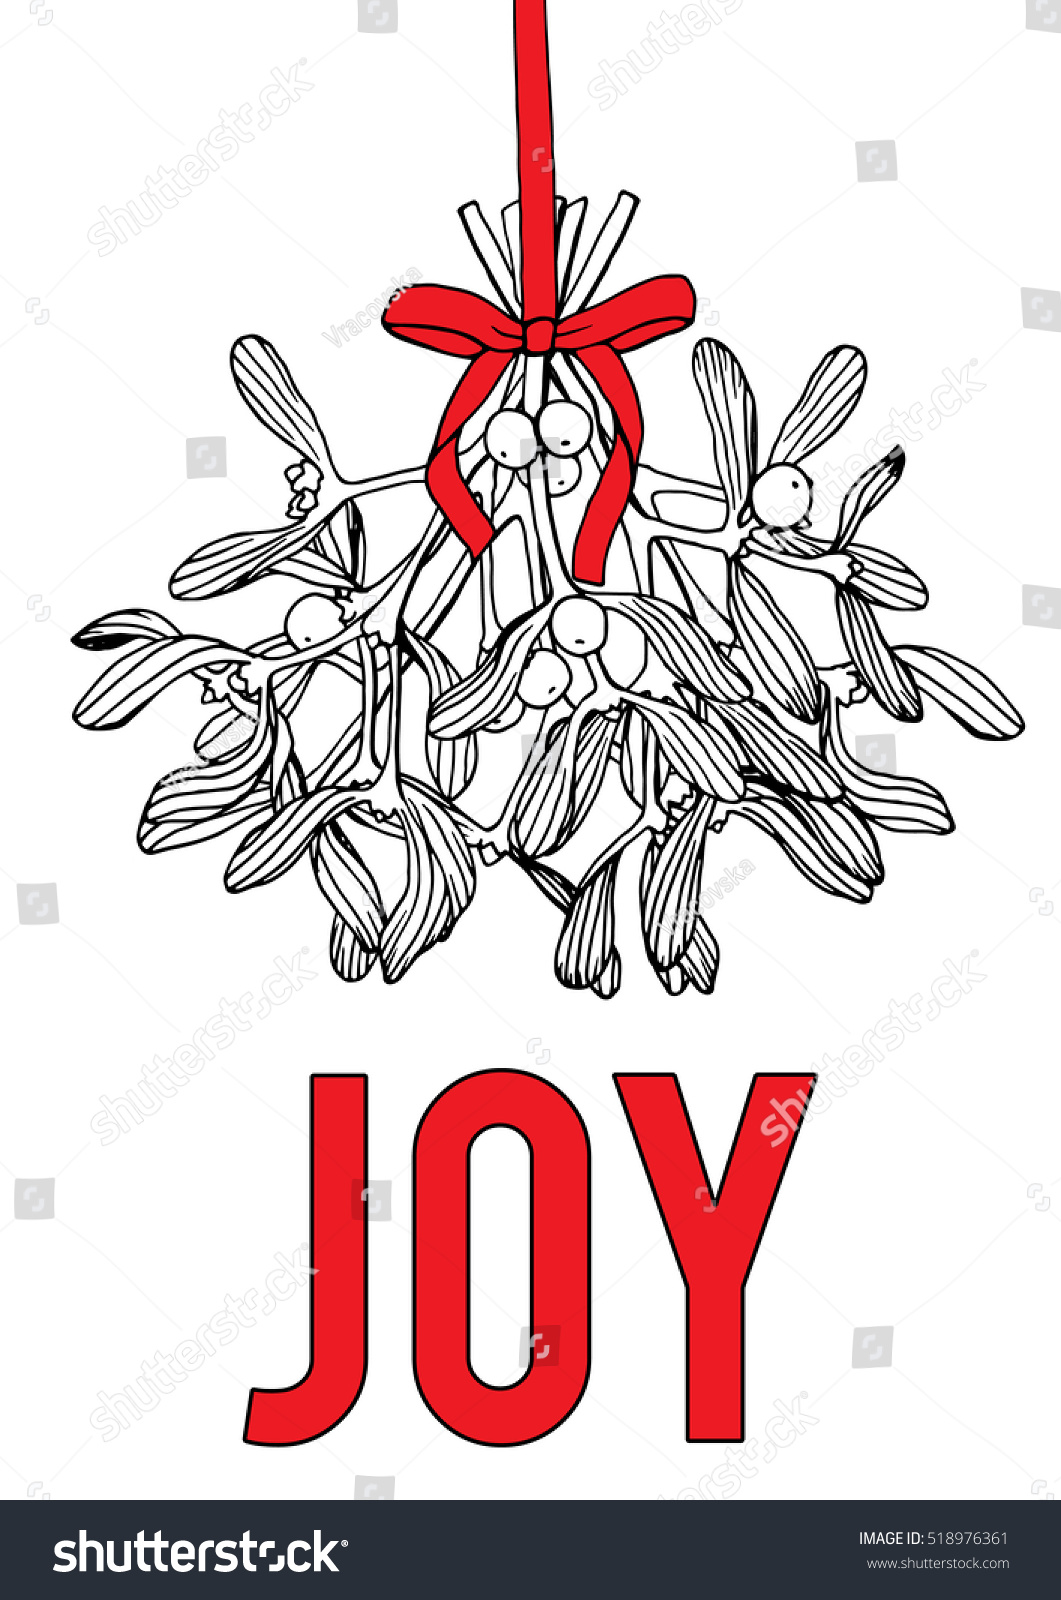 JOY Hand Drawn Christmas Card Mistletoe Stock Vector (Royalty Free ...